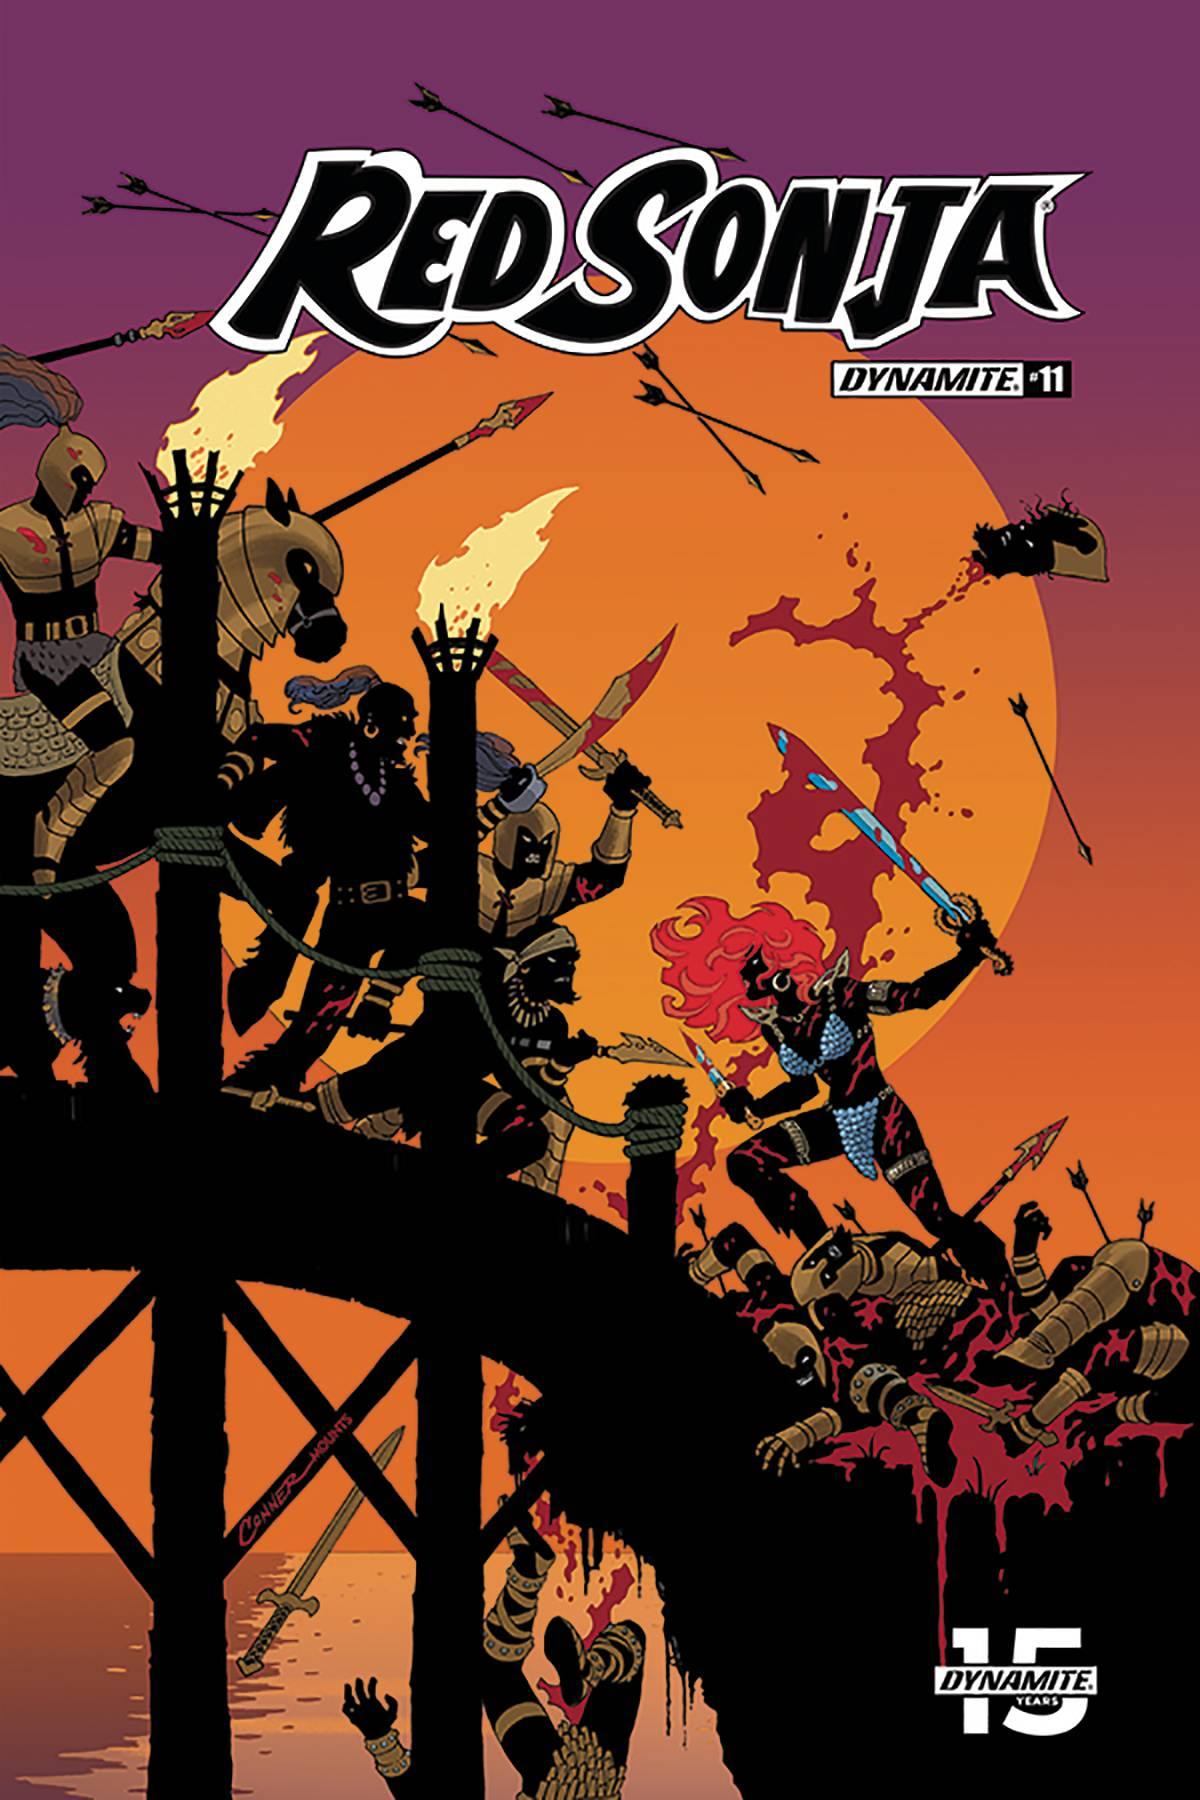 Red Sonja #11 (2019)